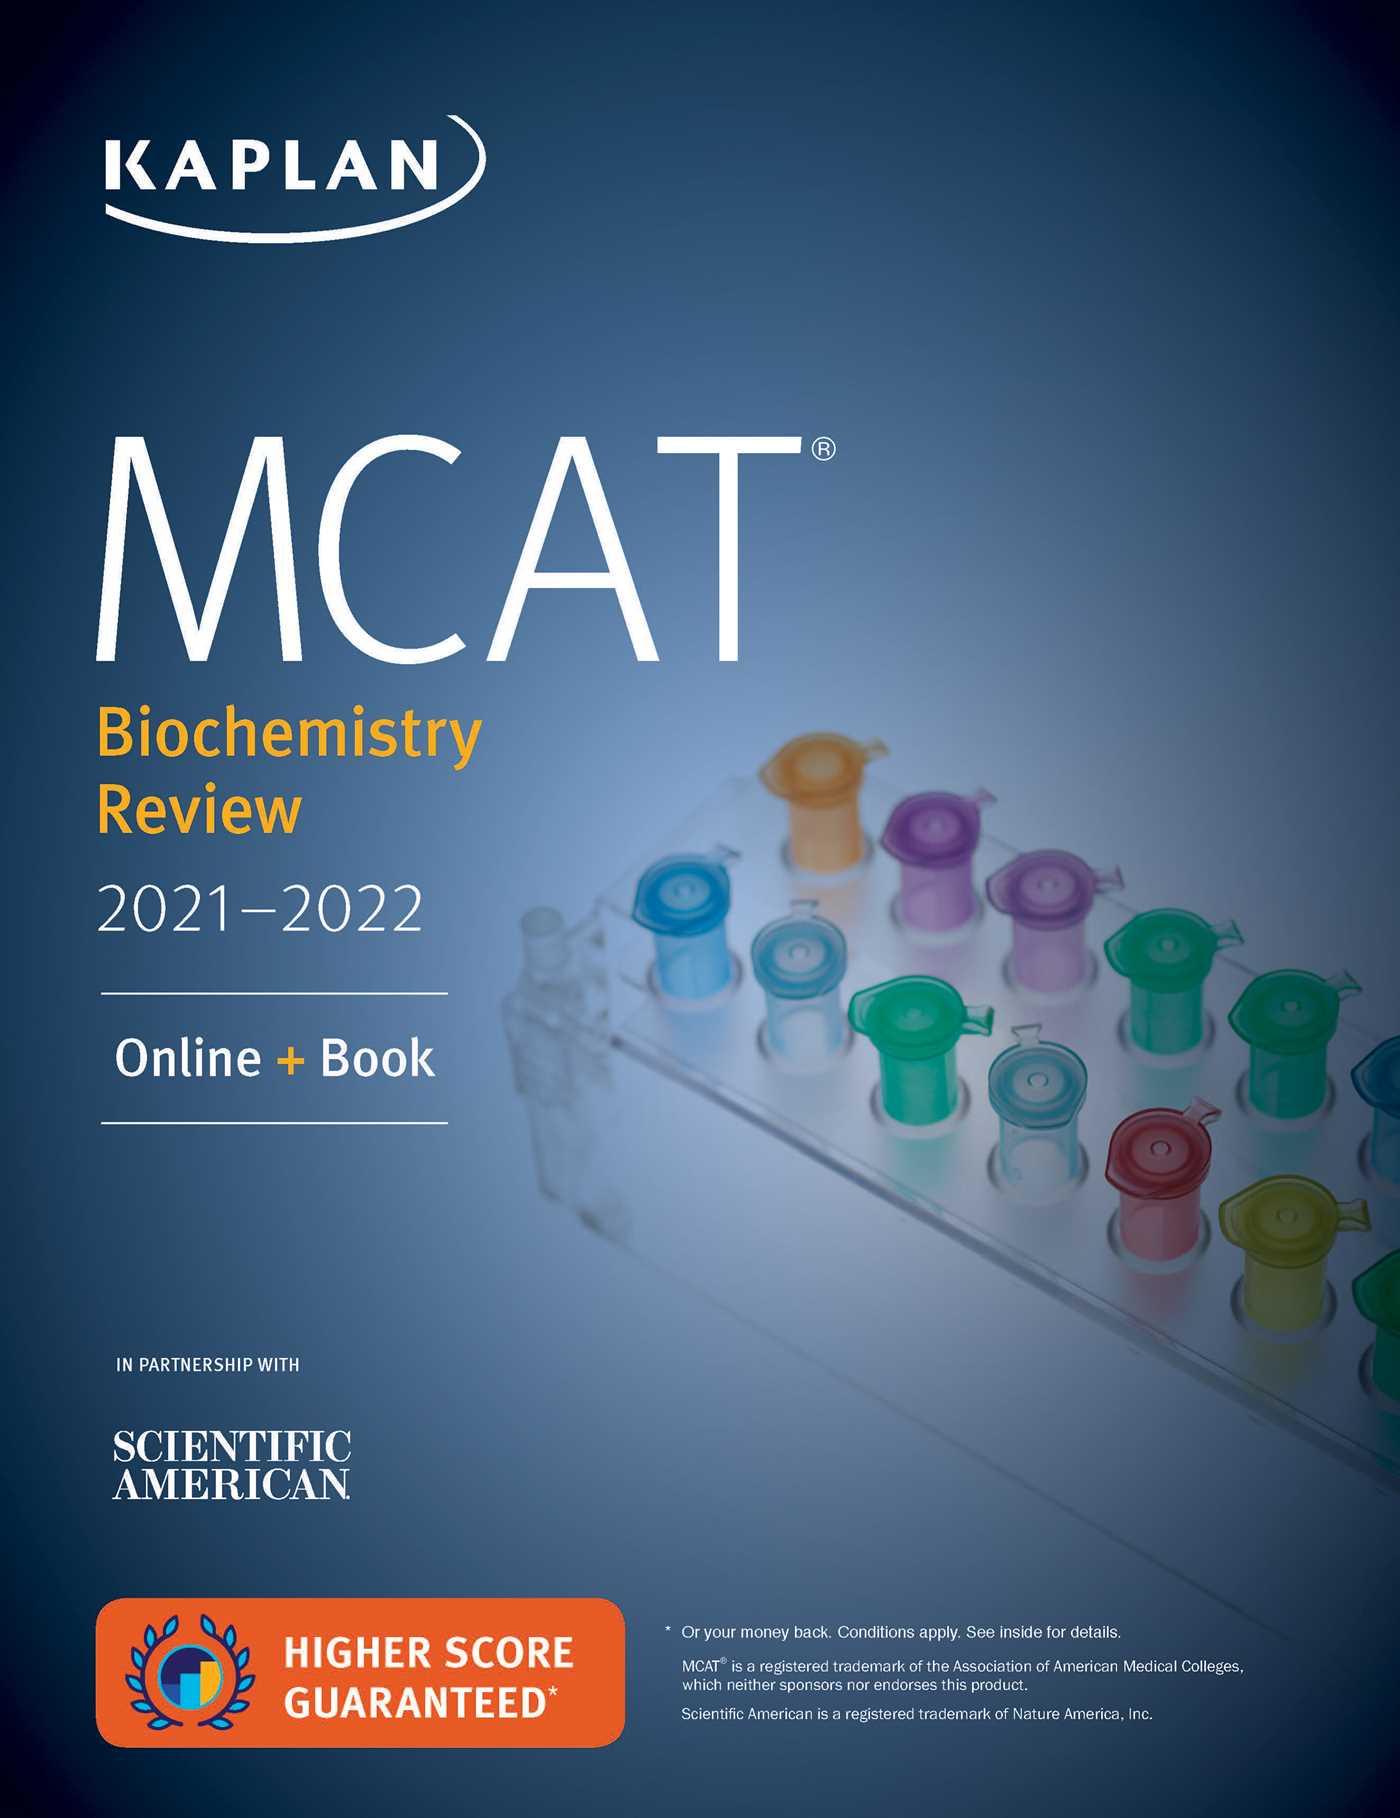 MCAT Biochemistry Review 2021-2022